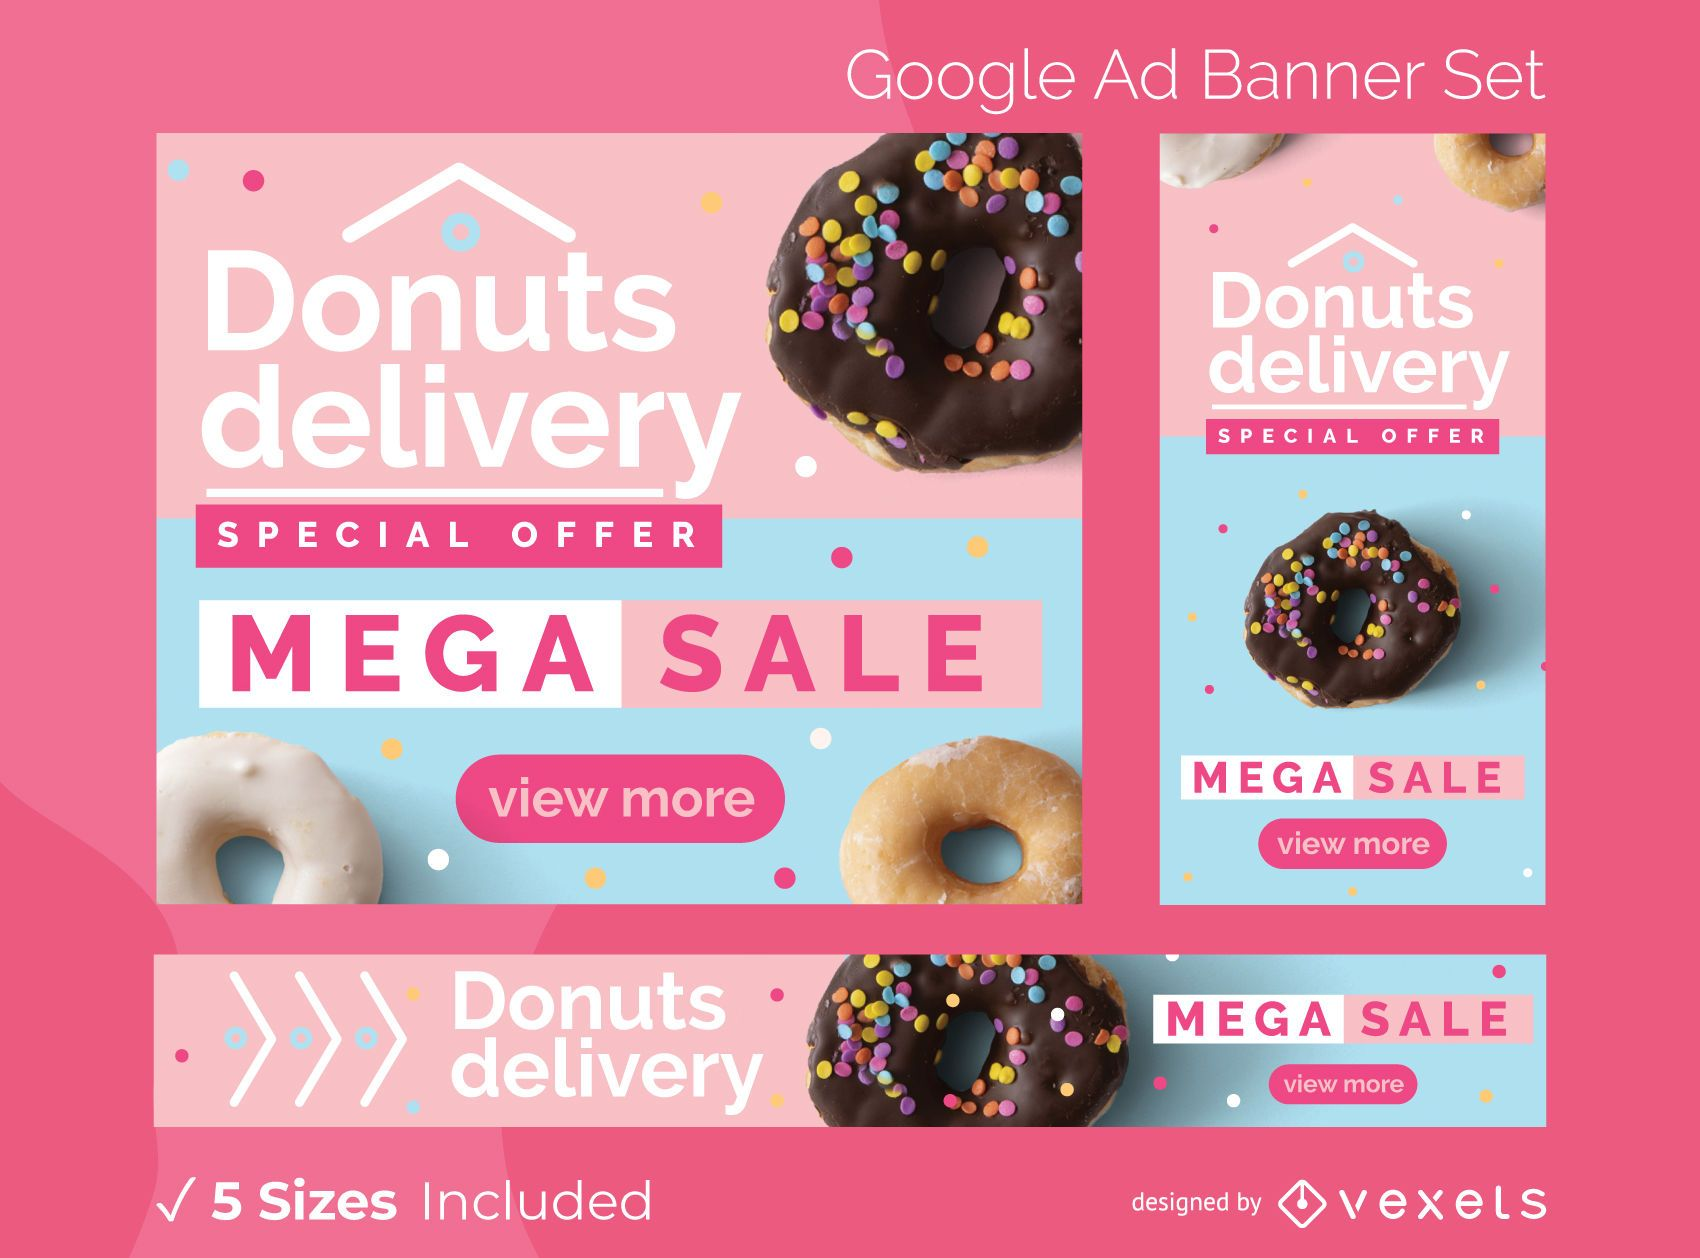 Donuts delivery ads banner set